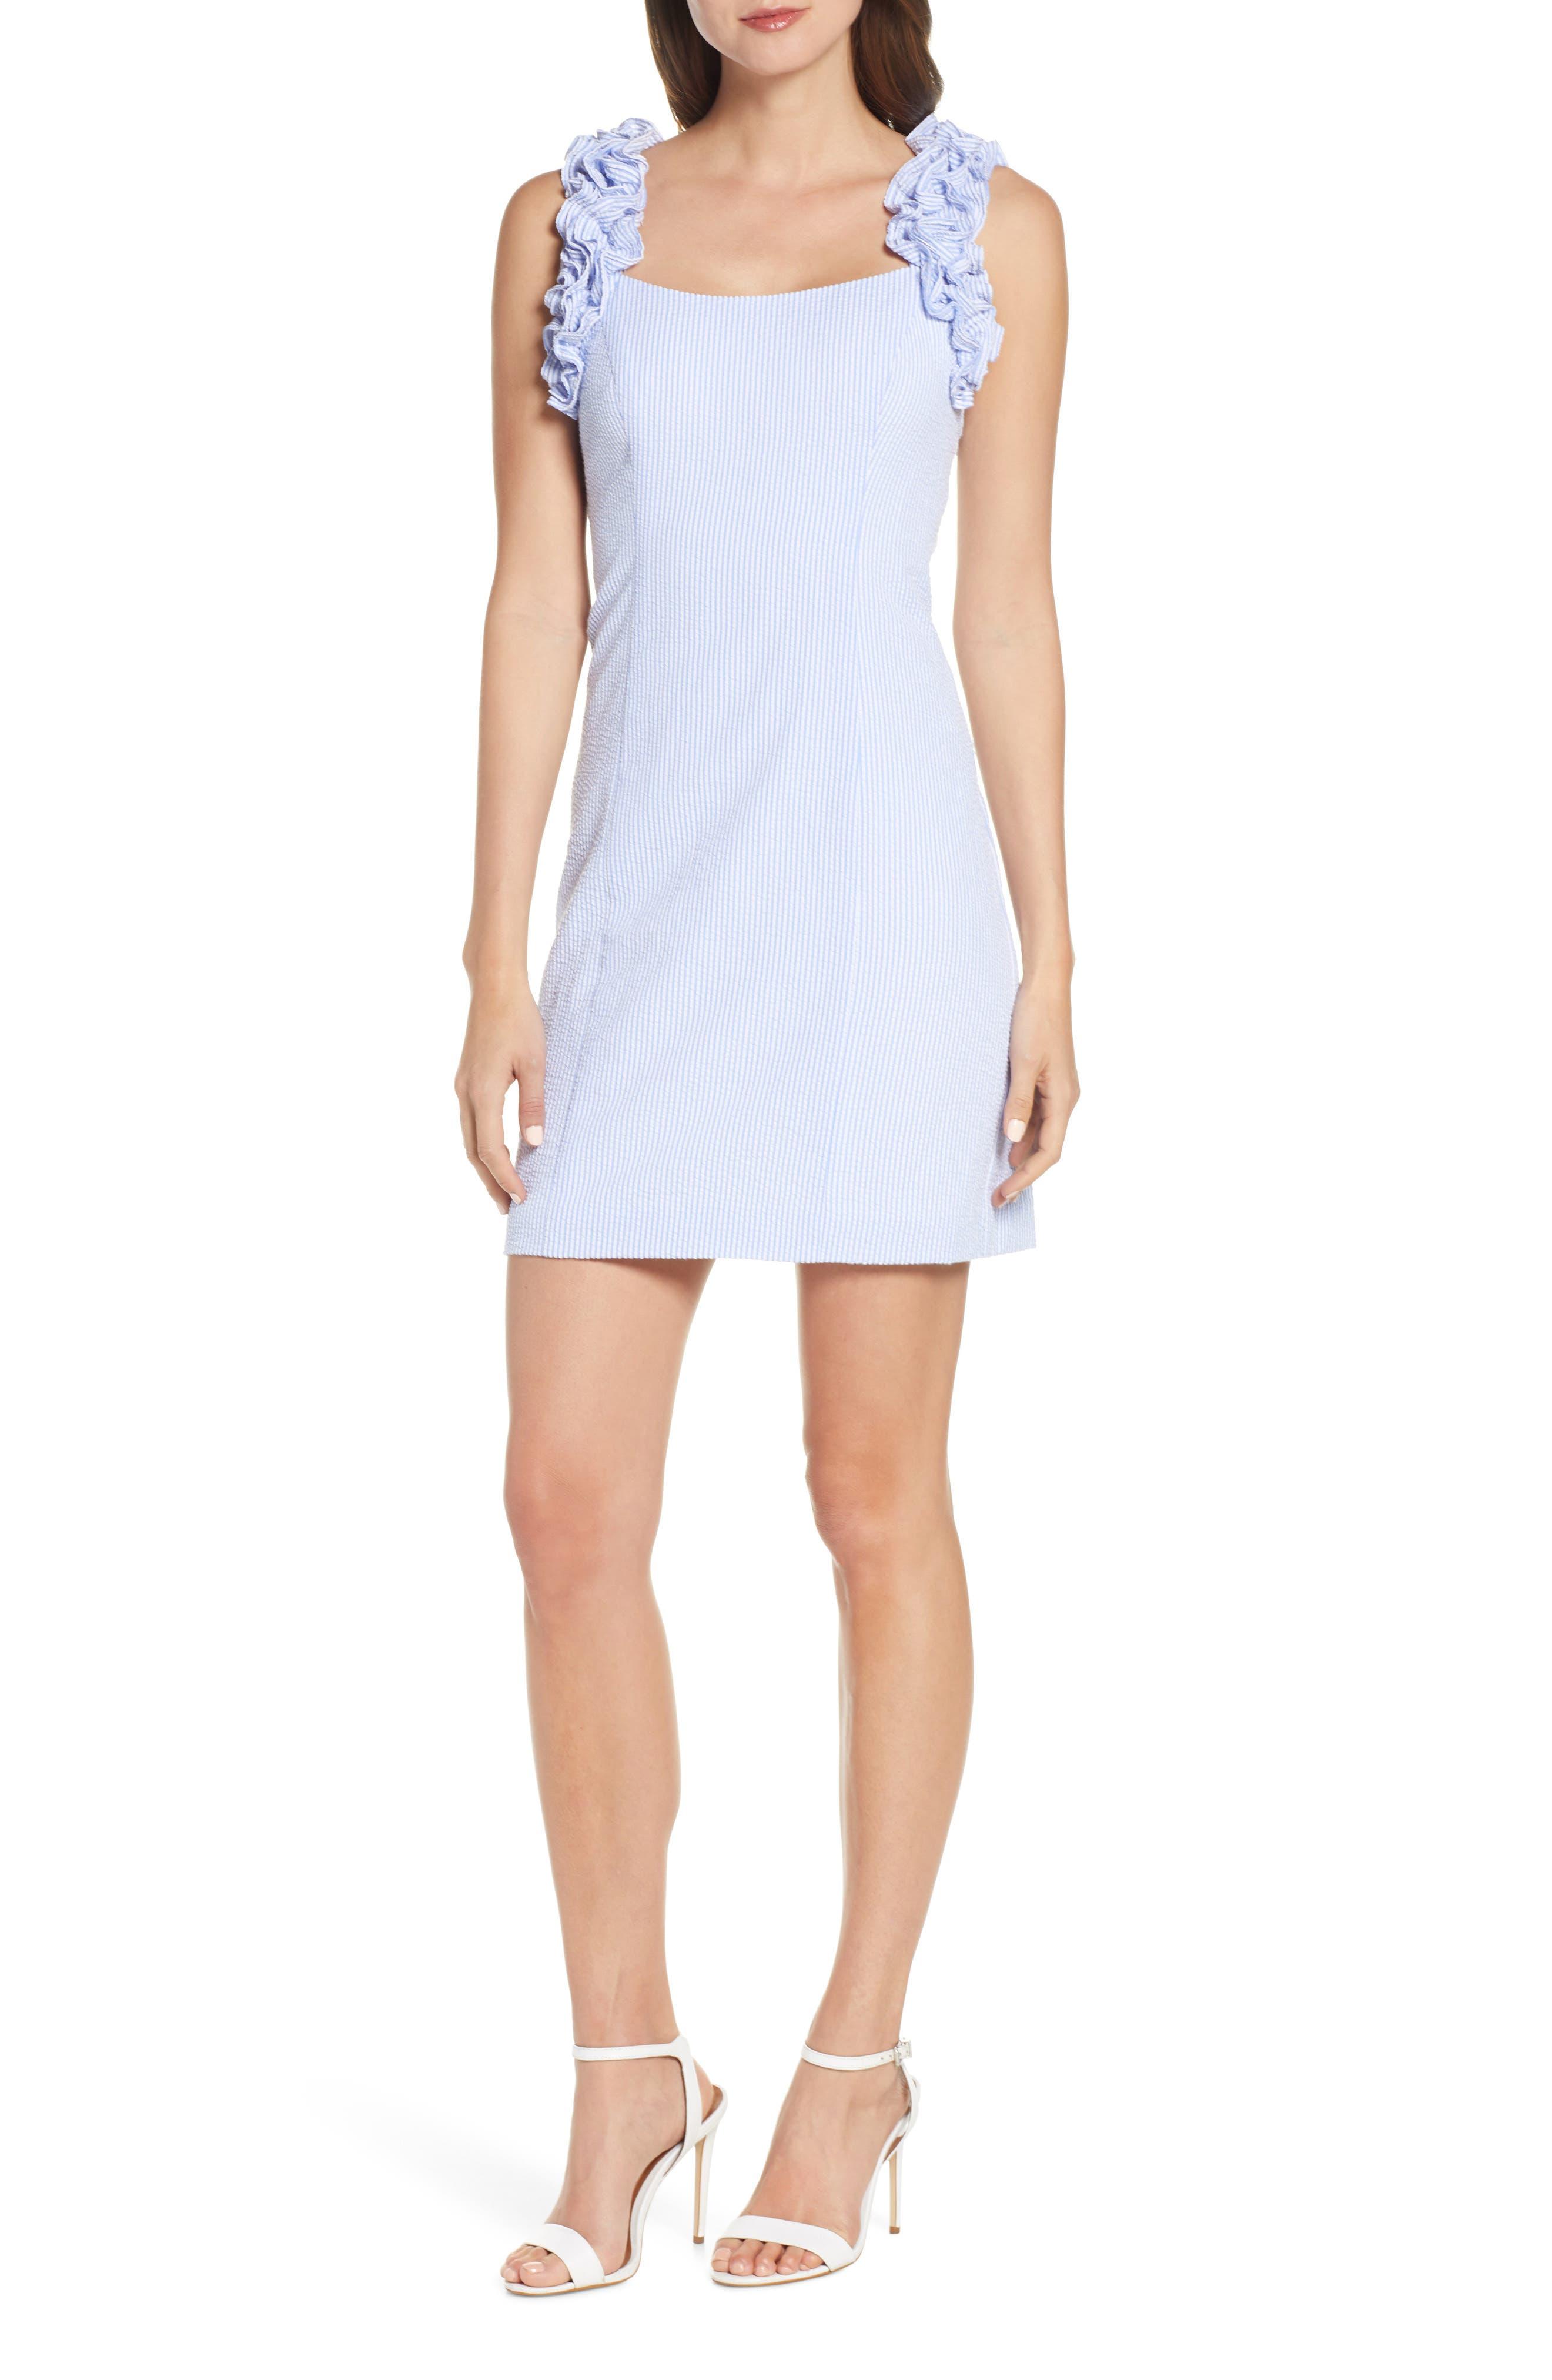 Eliza J Ruffle Strap Sheath Dress, 8 (similar to 1) - Blue